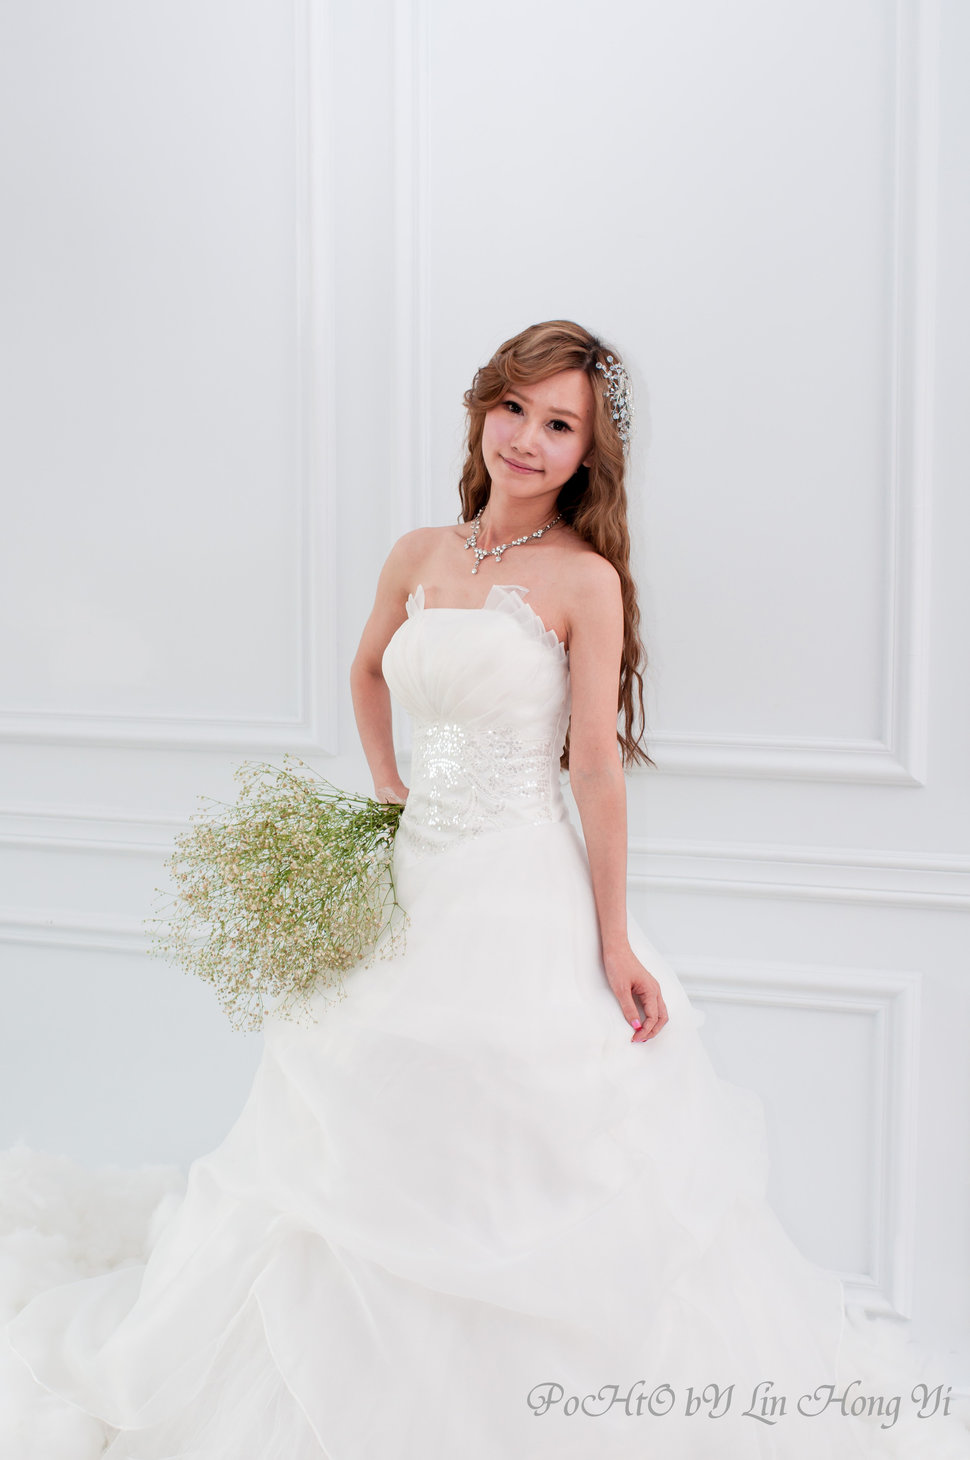 DSC_1264 - 小林哥Hung YI攝影工作室《結婚吧》